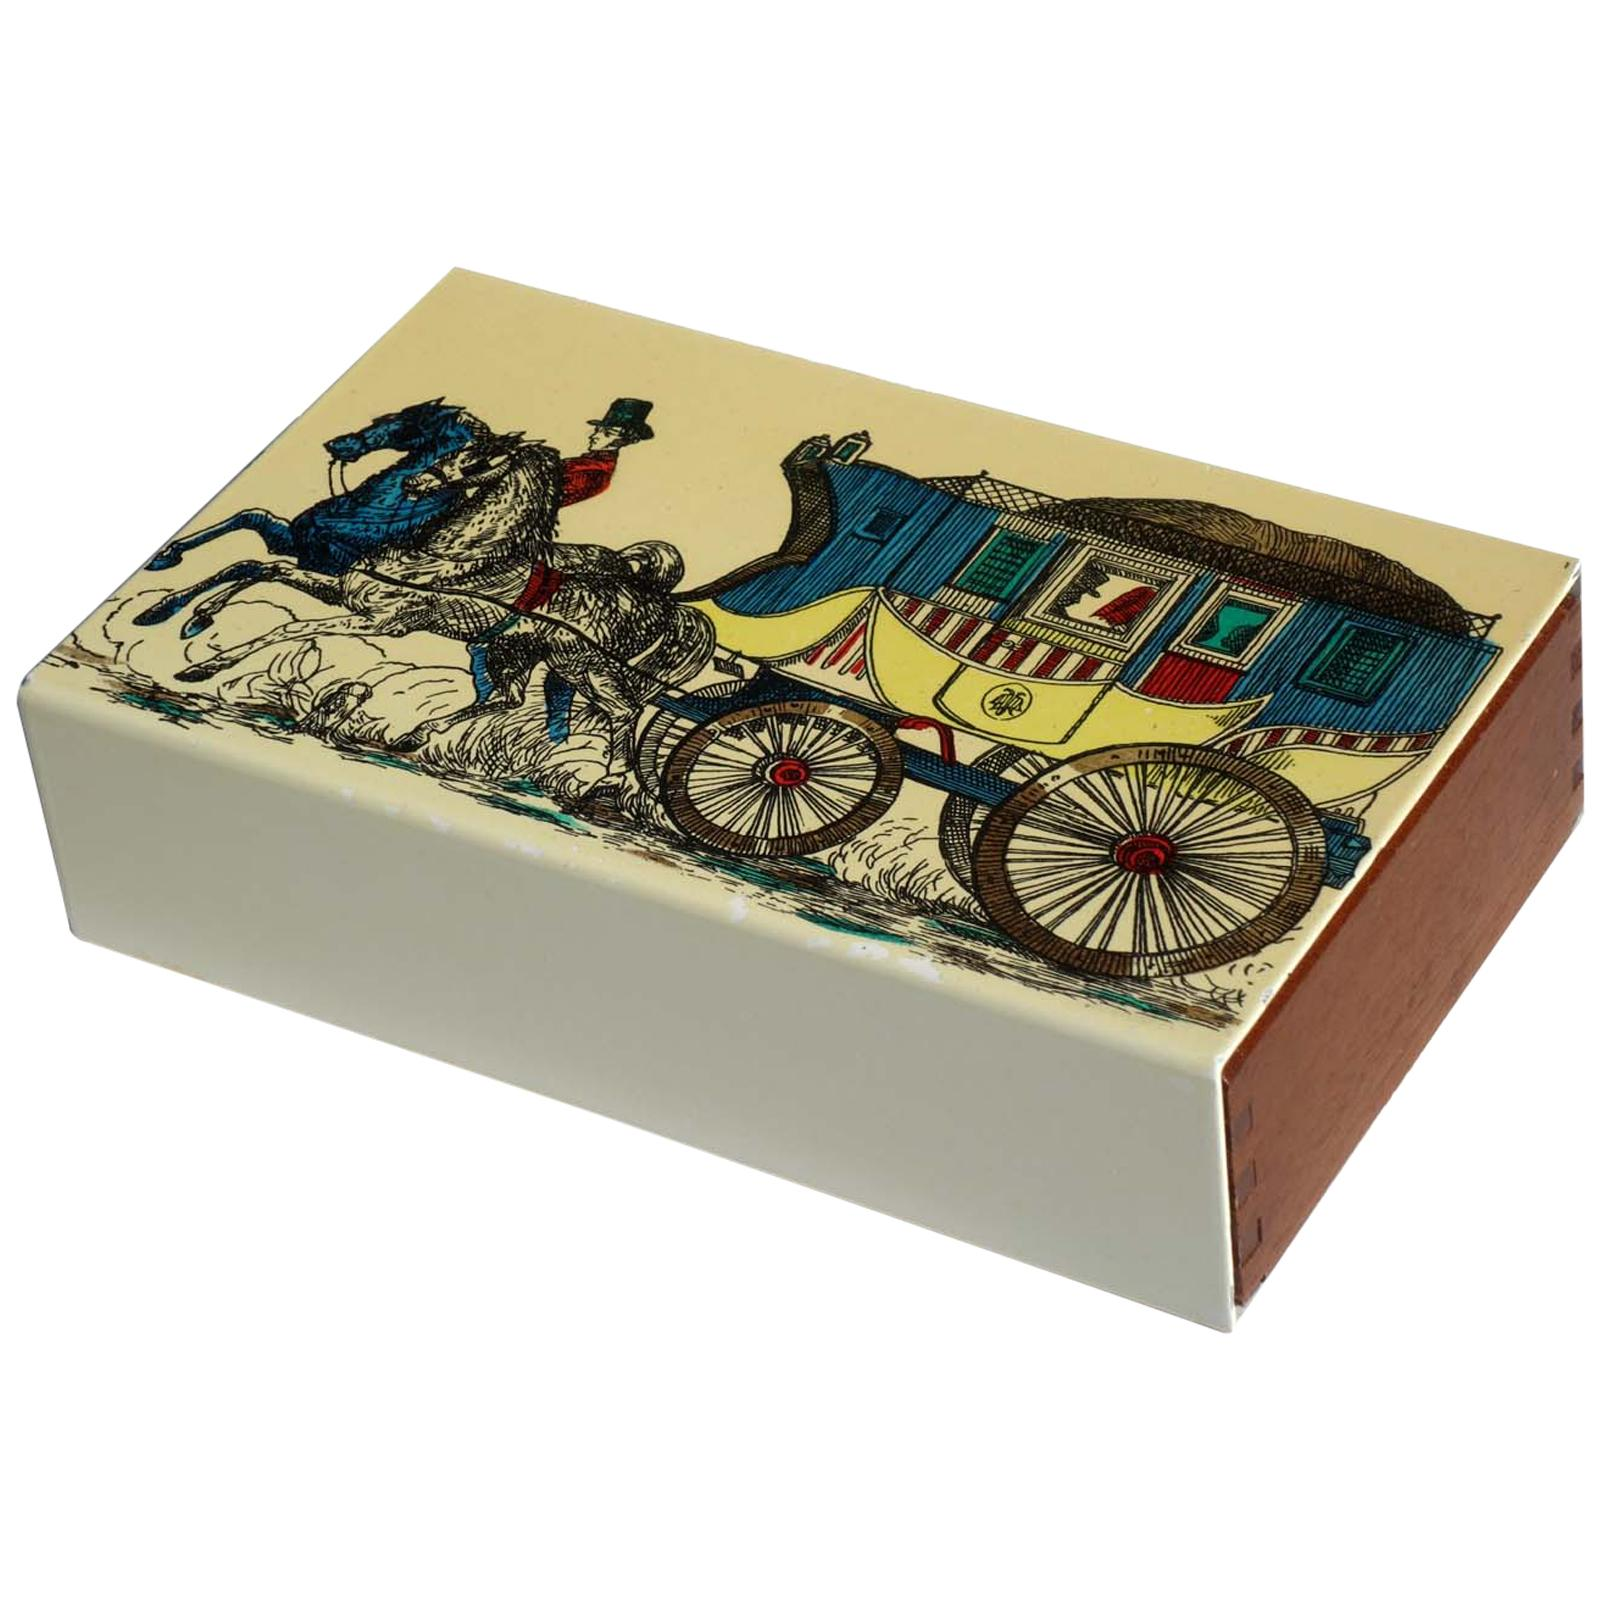 1950s by Piero Fornasetti Midcentury Italian Design Box